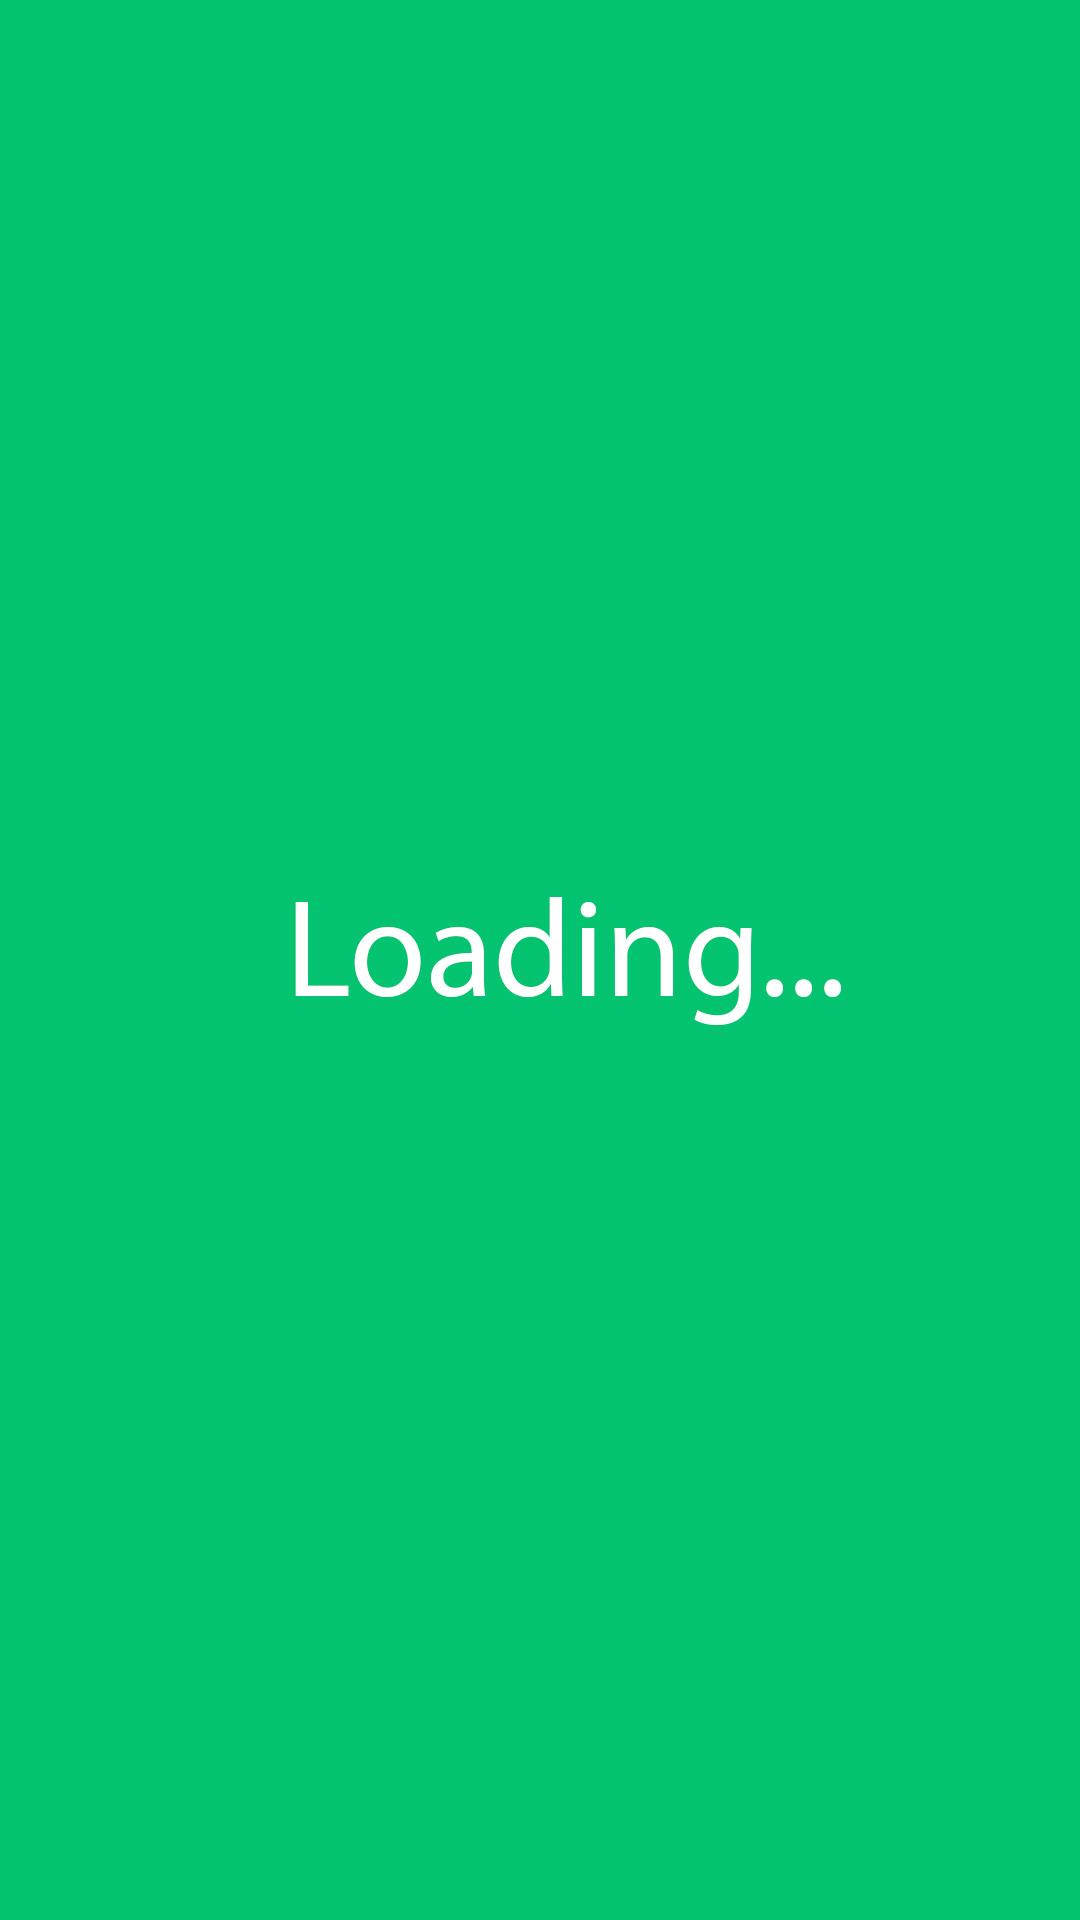 Loading Screen.jpg